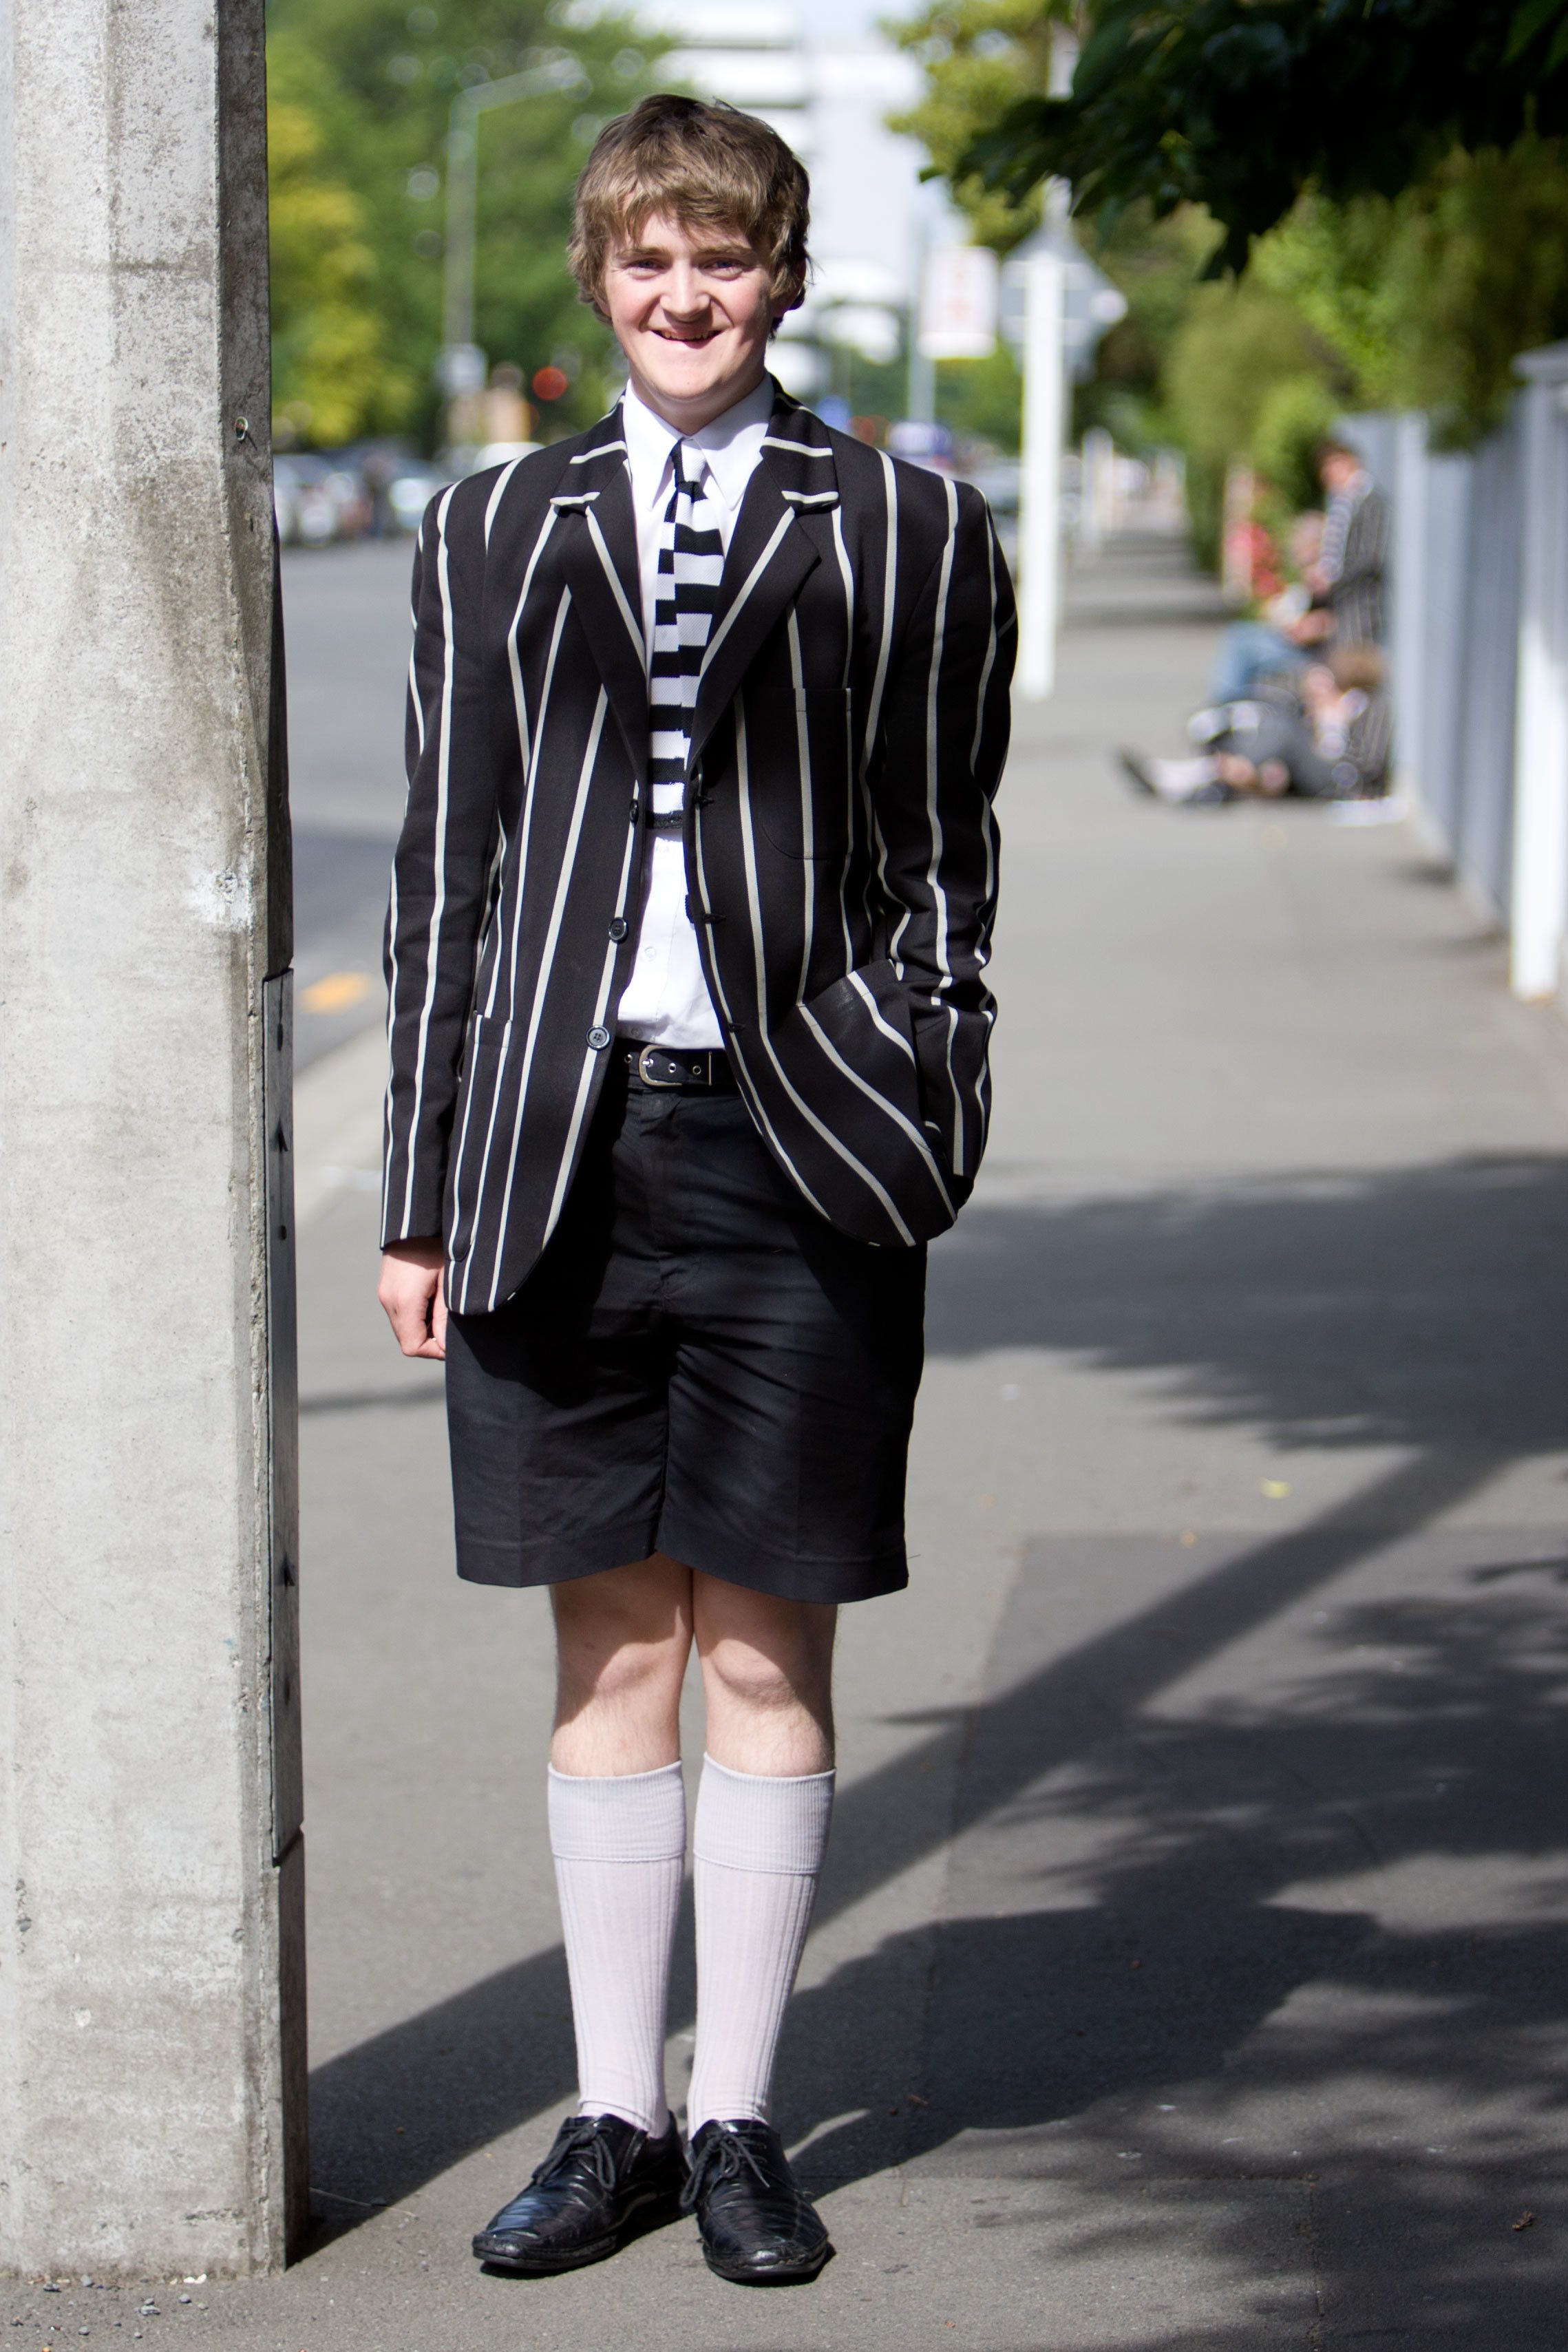 Wellington_New_Zealand.jpg